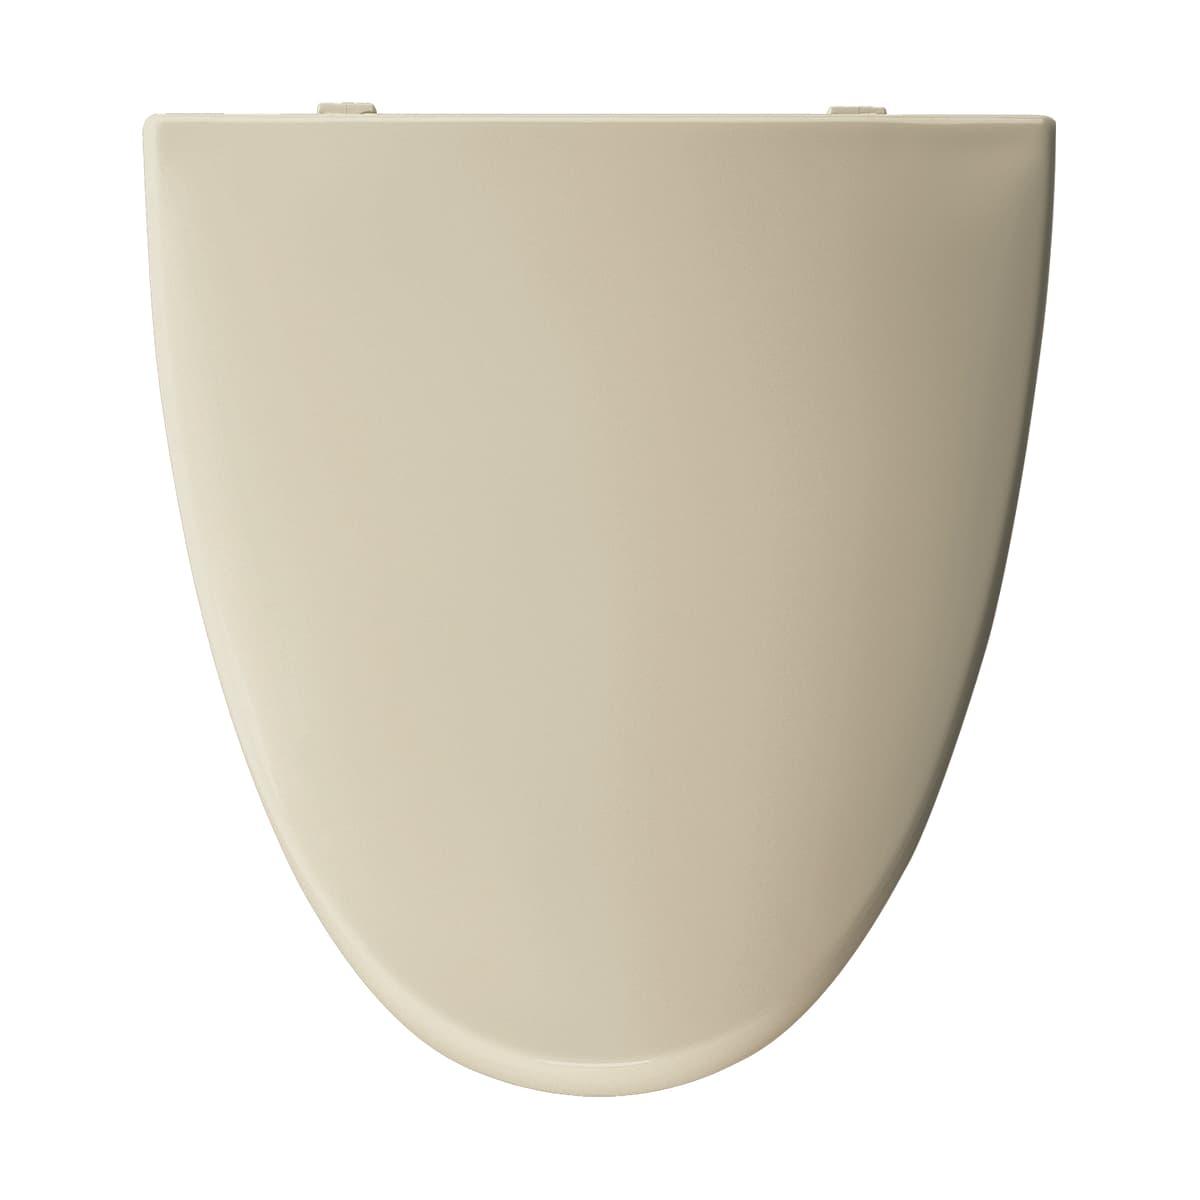 Pleasant Bemis El270 162 Silver Elongated Plastic Toilet Seat Creativecarmelina Interior Chair Design Creativecarmelinacom